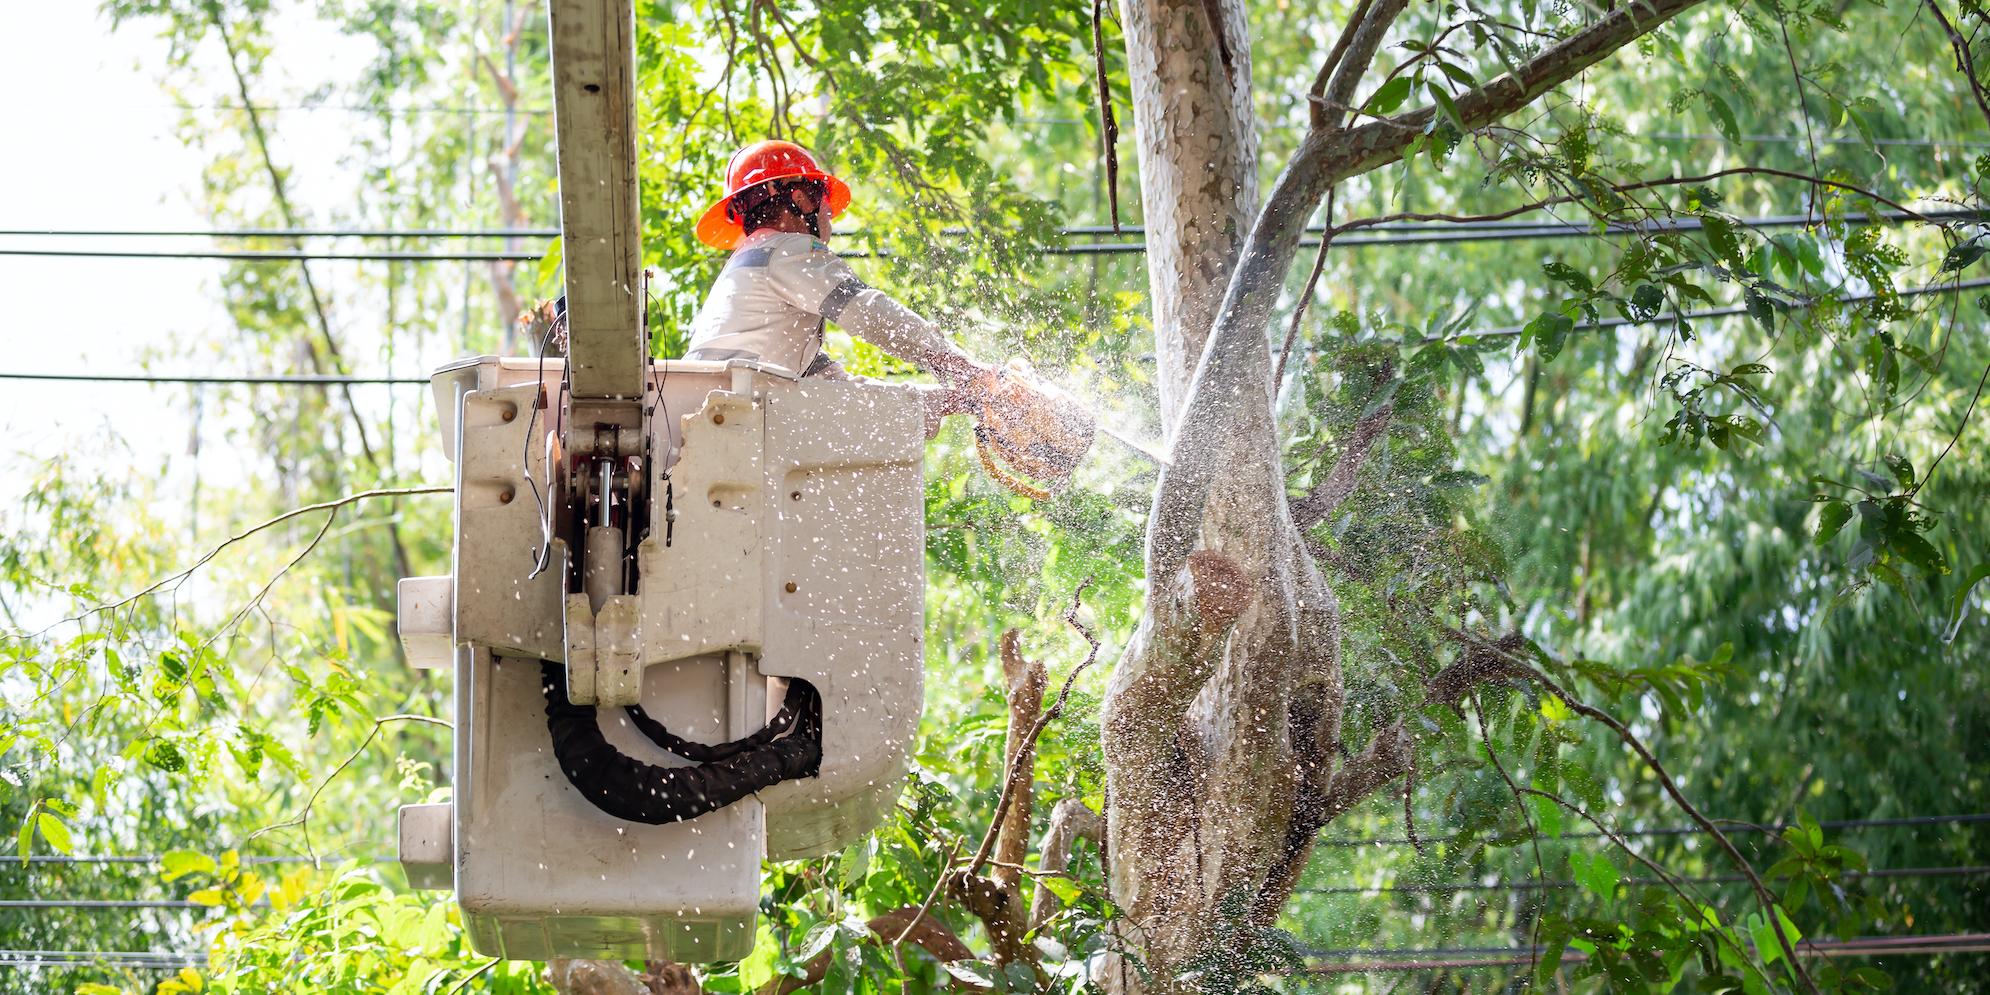 4 Pressures Utility Vegetation Managers Face